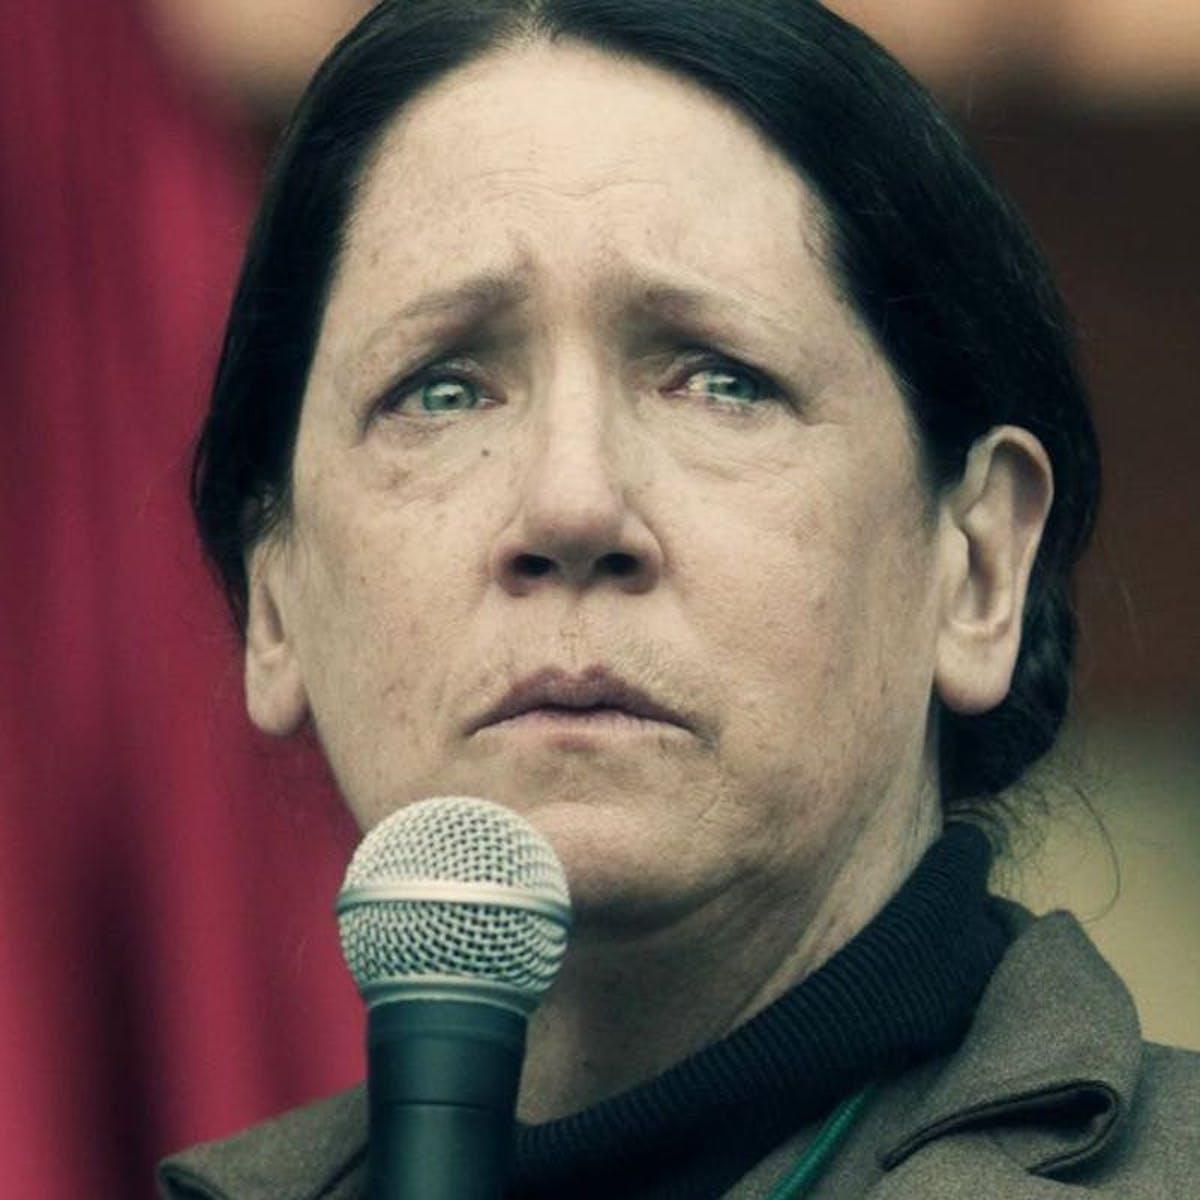 Handmaid's Tale' Season 3 Episode 8 Spoilers: Aunt Lydia's Backstory